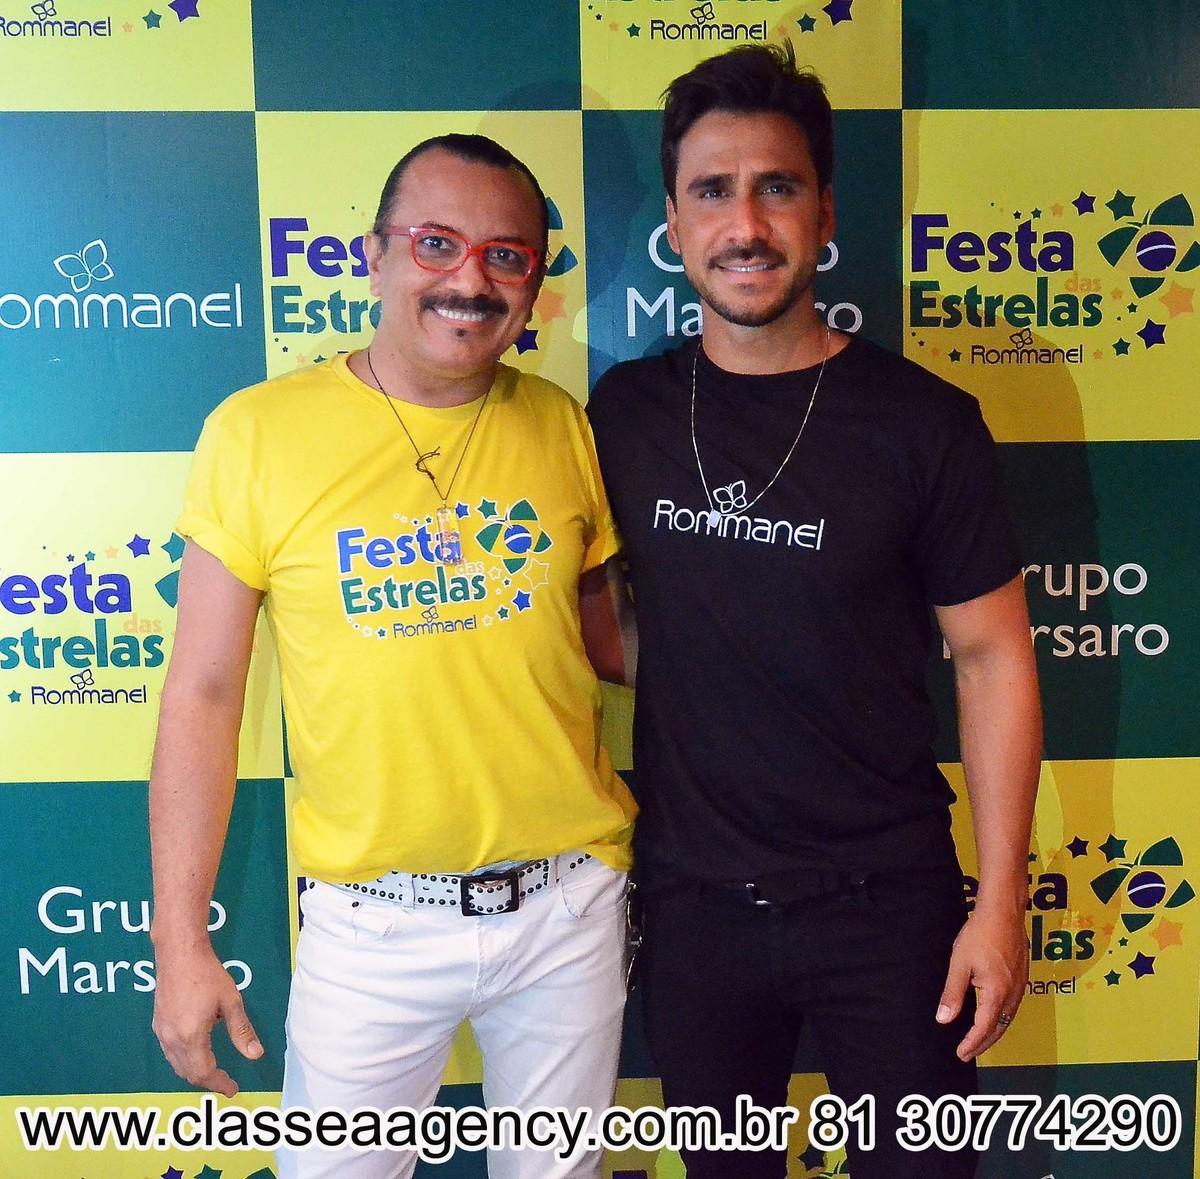 Augusto Werner e Julio Rocha na festas das estrelas da Rommanel